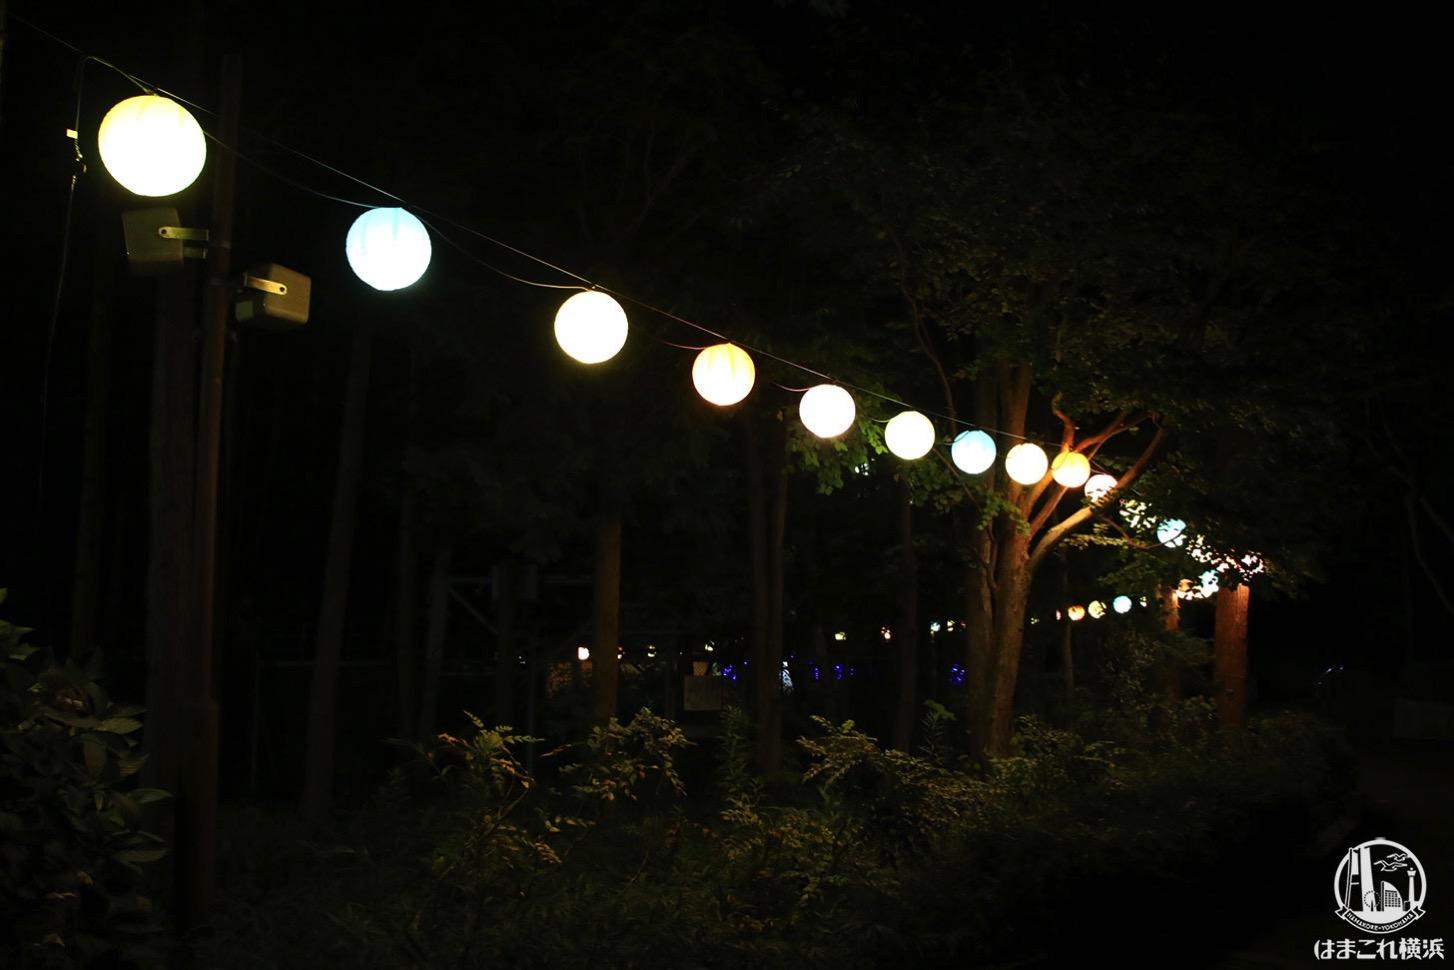 金沢動物園 夜の雰囲気